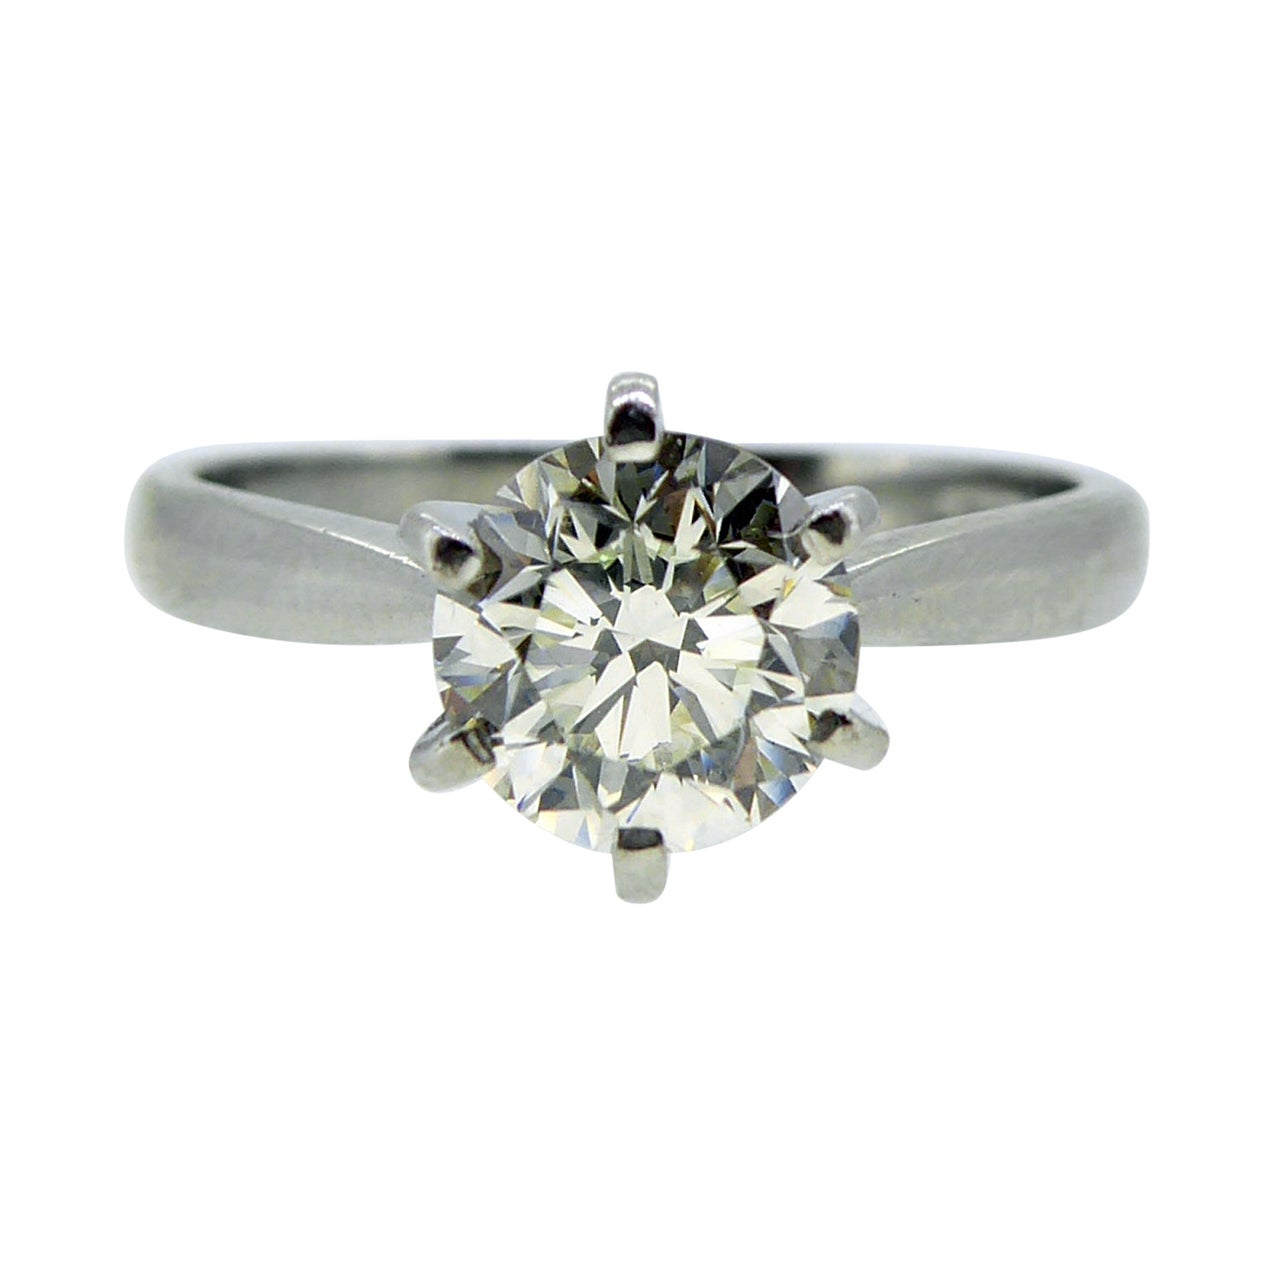 Certified 1.0 Carat Diamond Engagement Ring, Solitaire Setting, Platinum